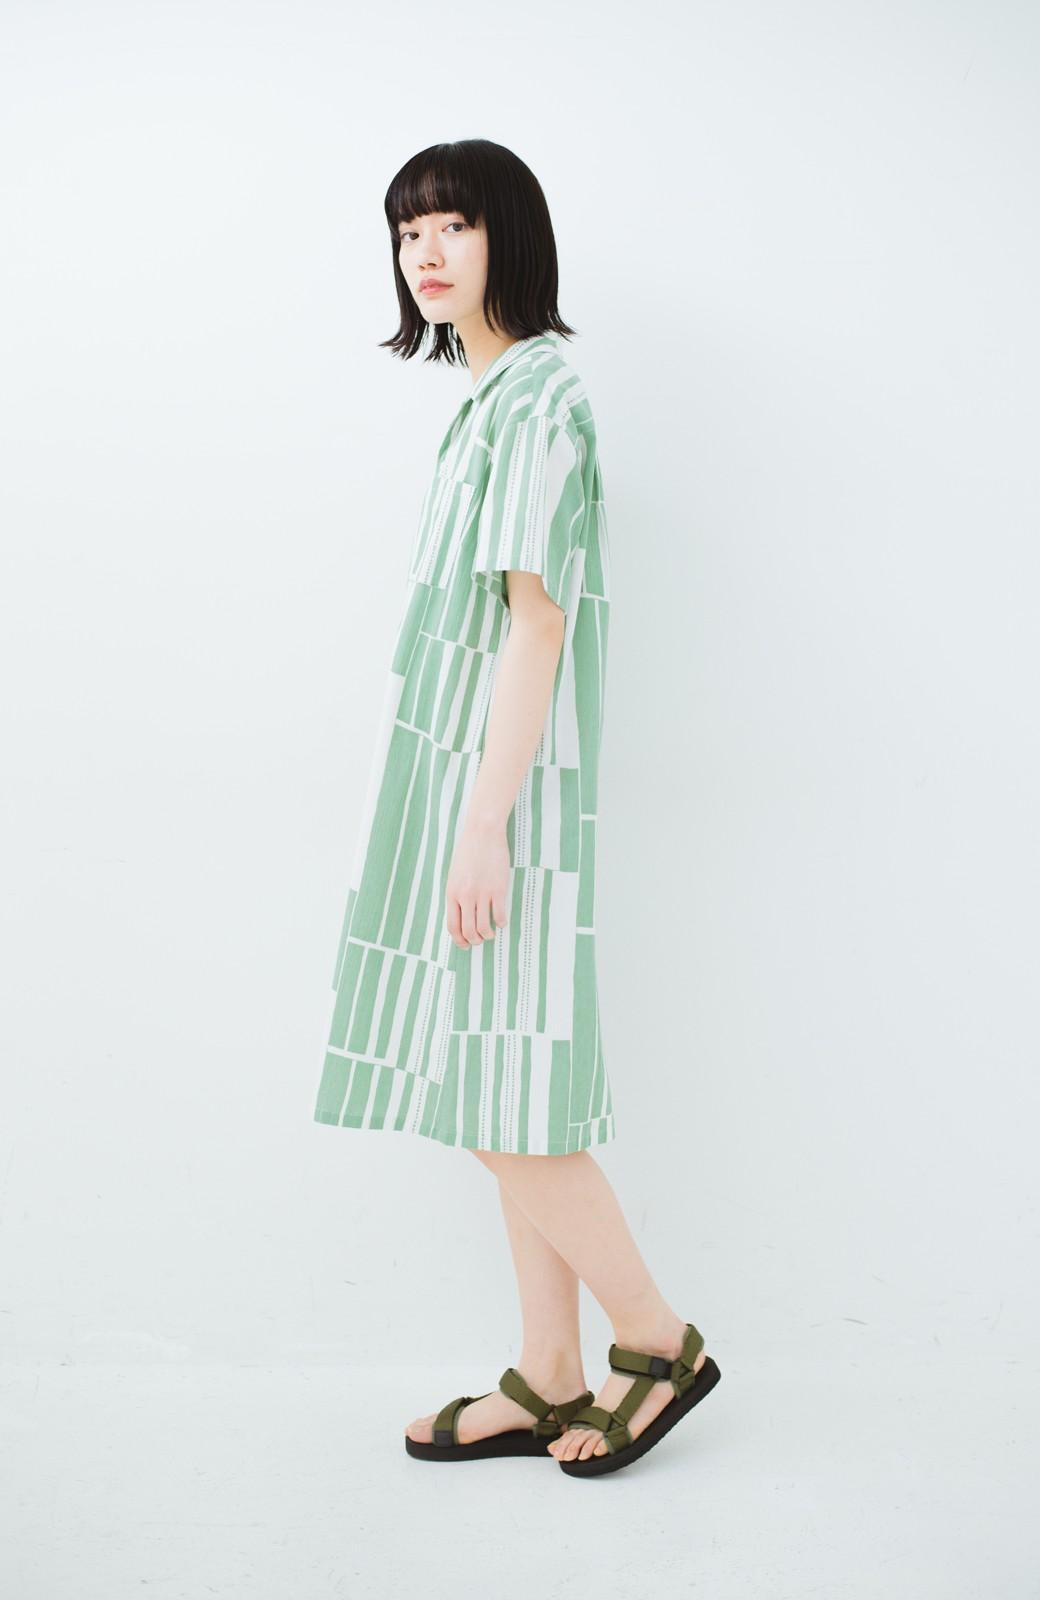 haco! 京都の浴衣屋さんと作った浴衣生地のシャツワンピース <グリーン系その他>の商品写真13